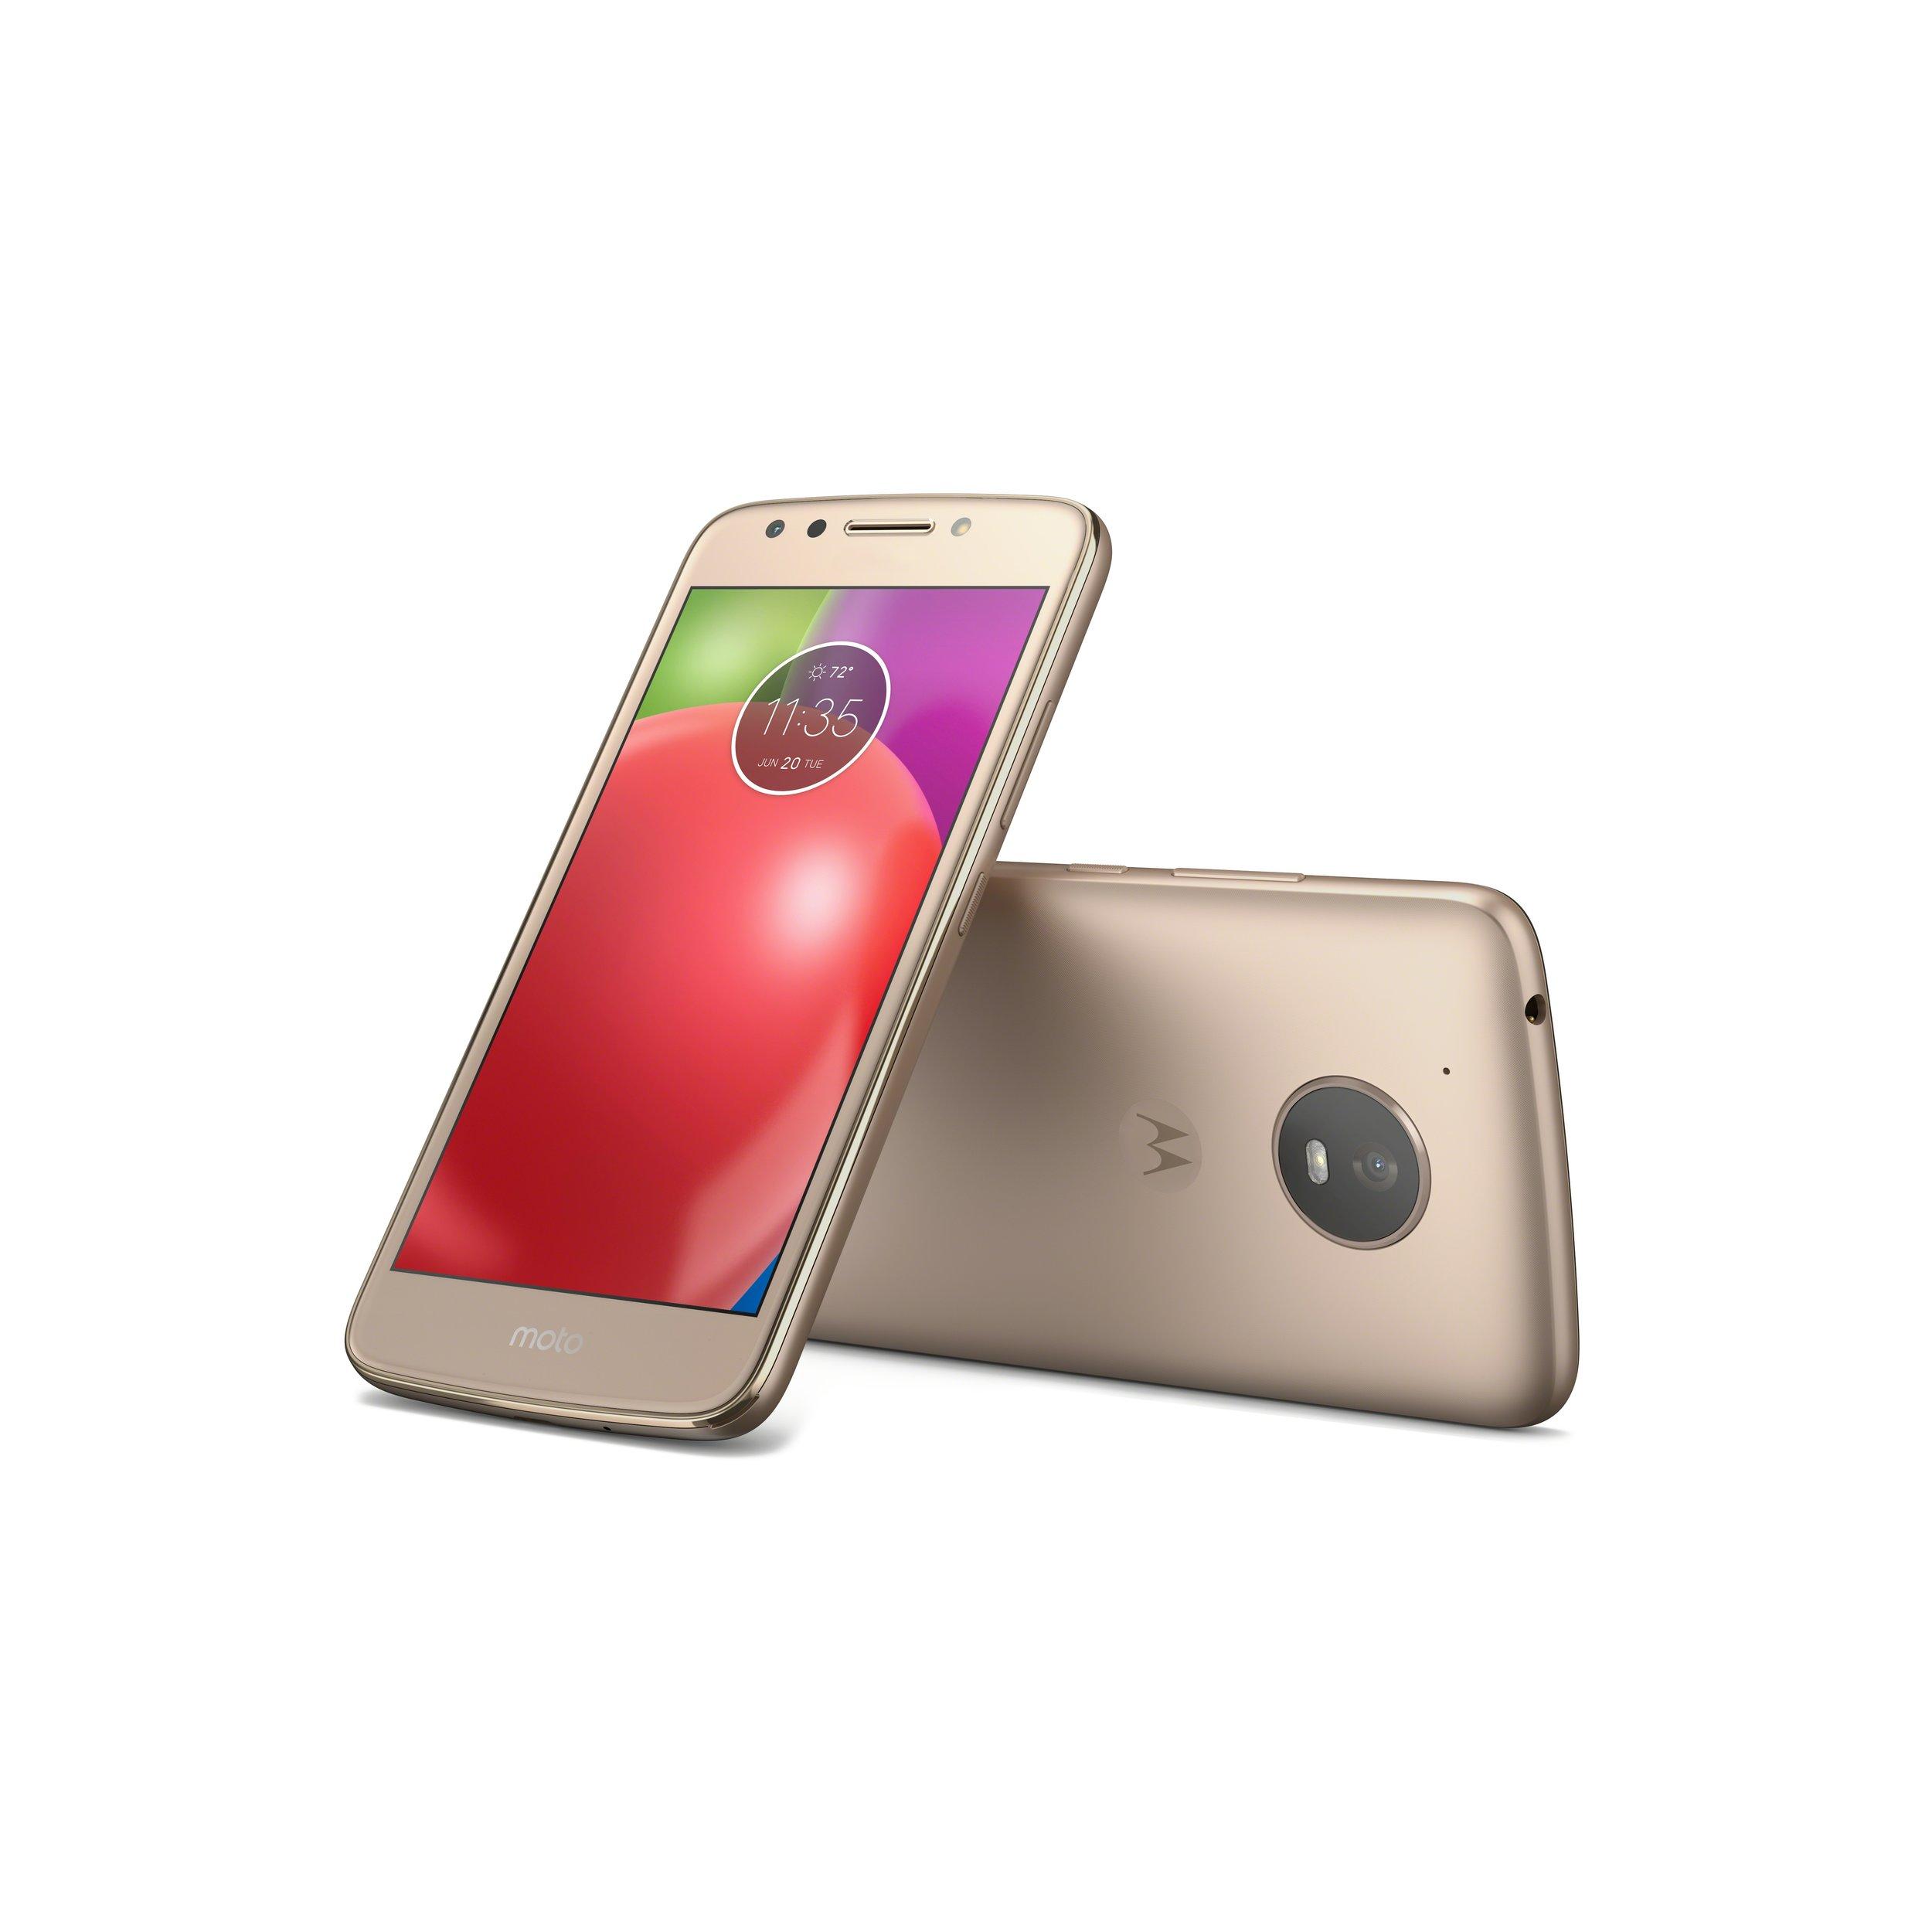 Moto E4_Fine Gold_Front_Back_Without Fingerprint Sensor.jpg